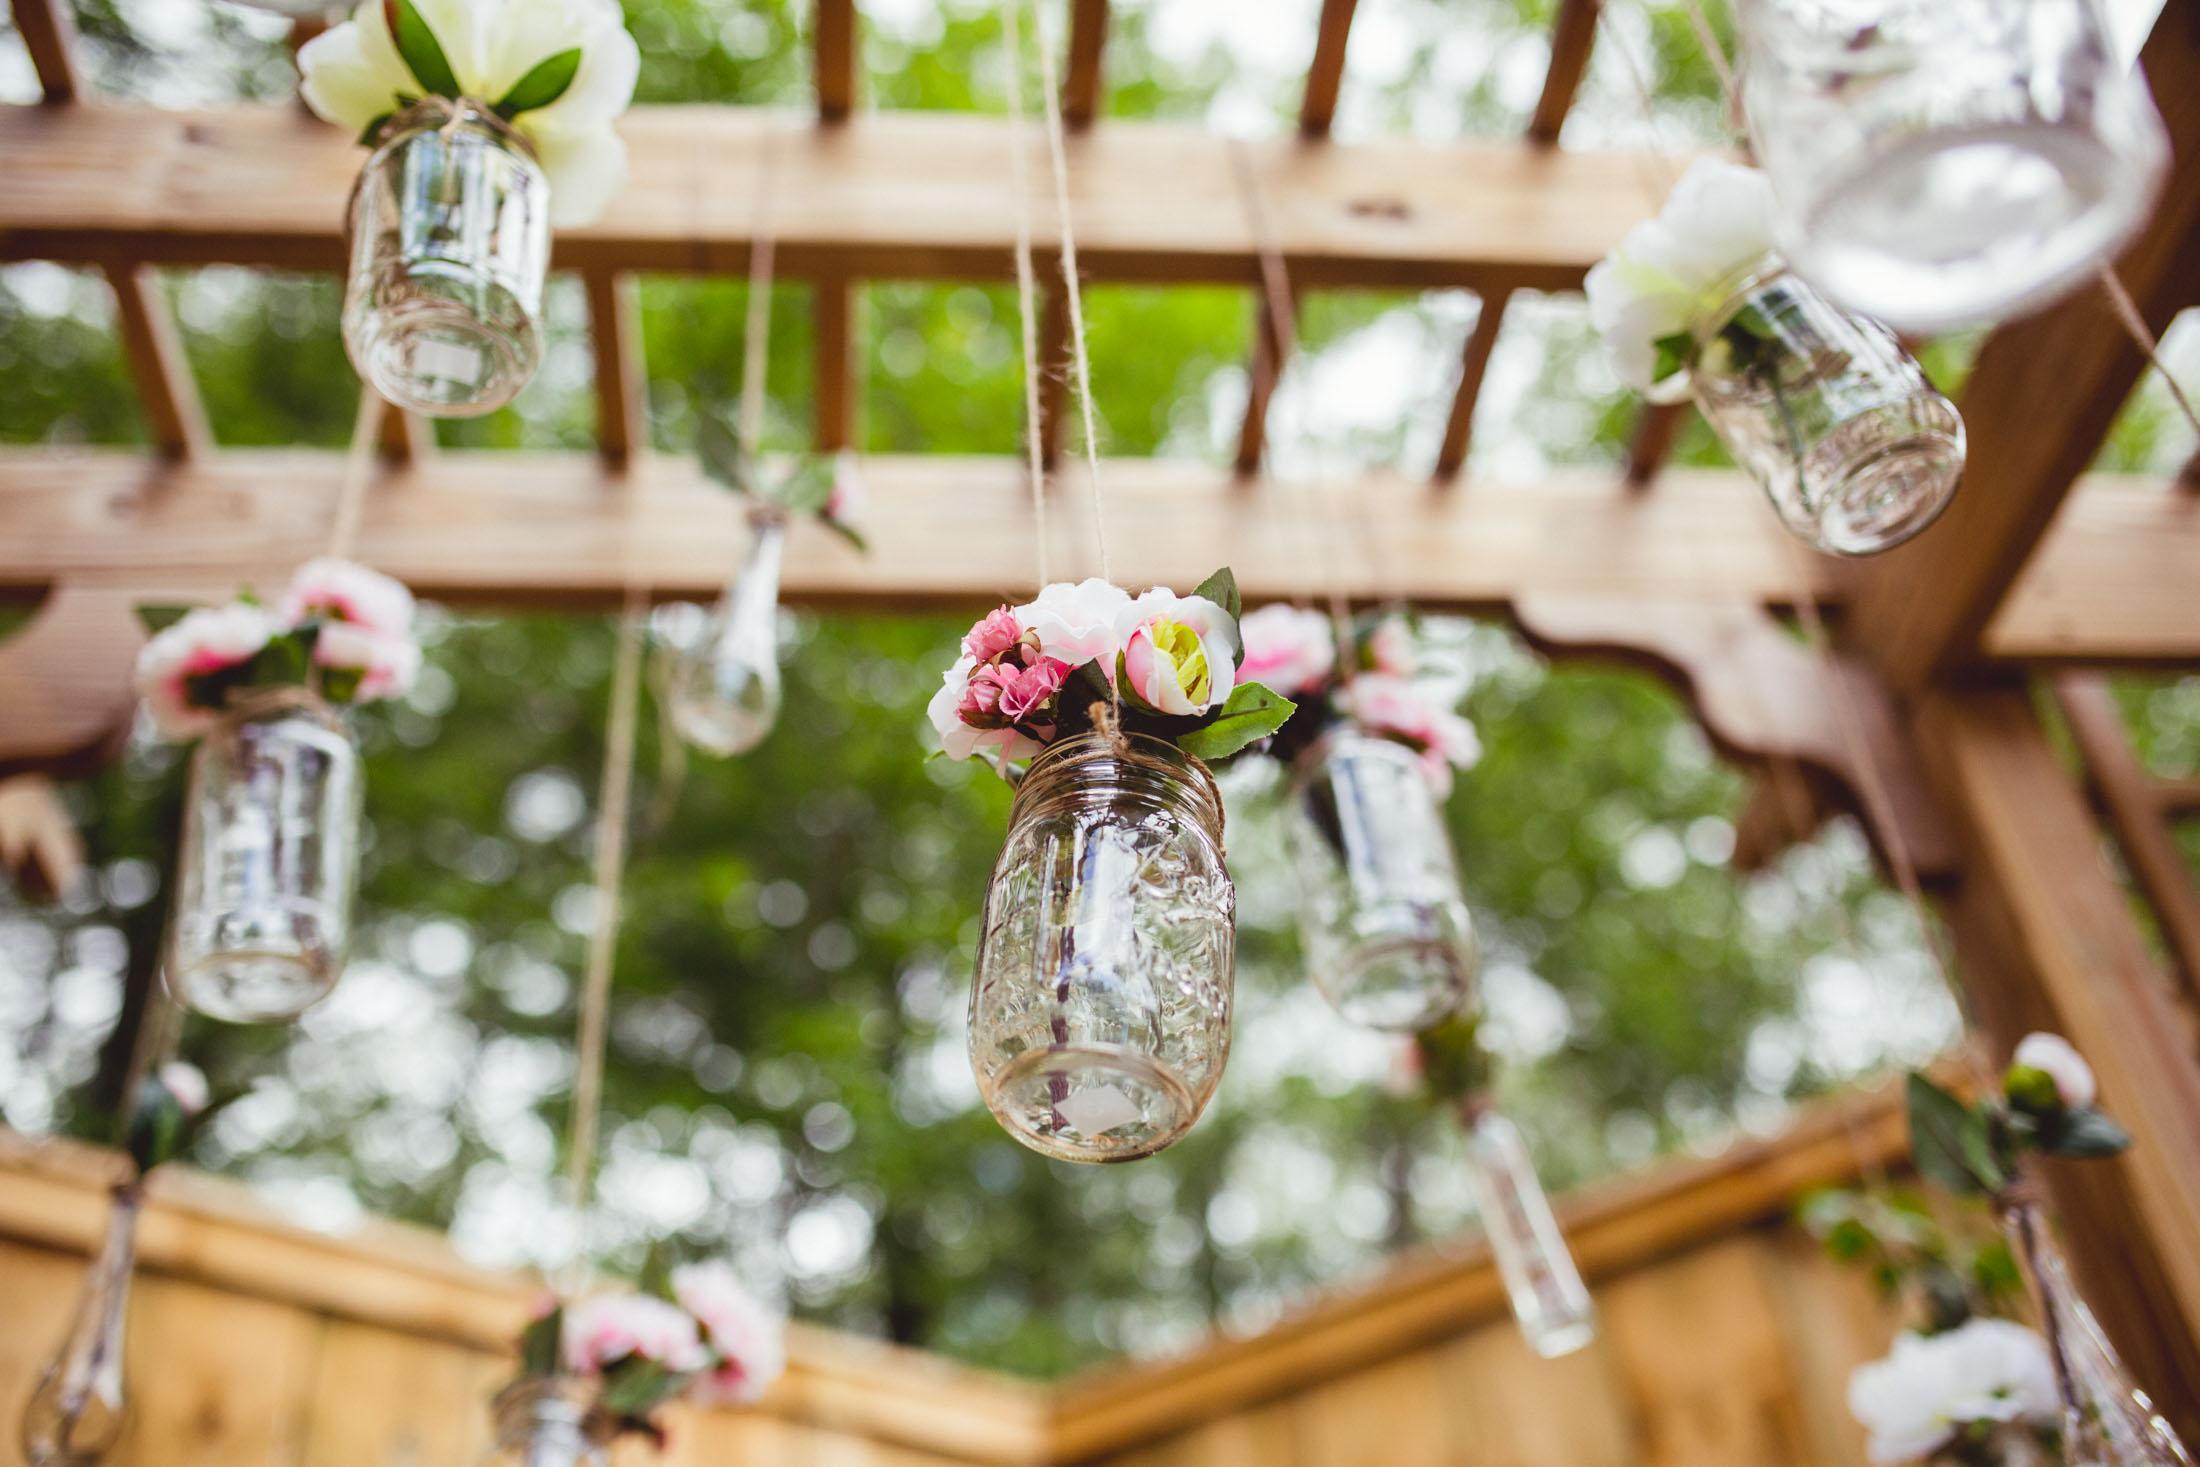 Blissful-Meadows-wedding-5.jpg